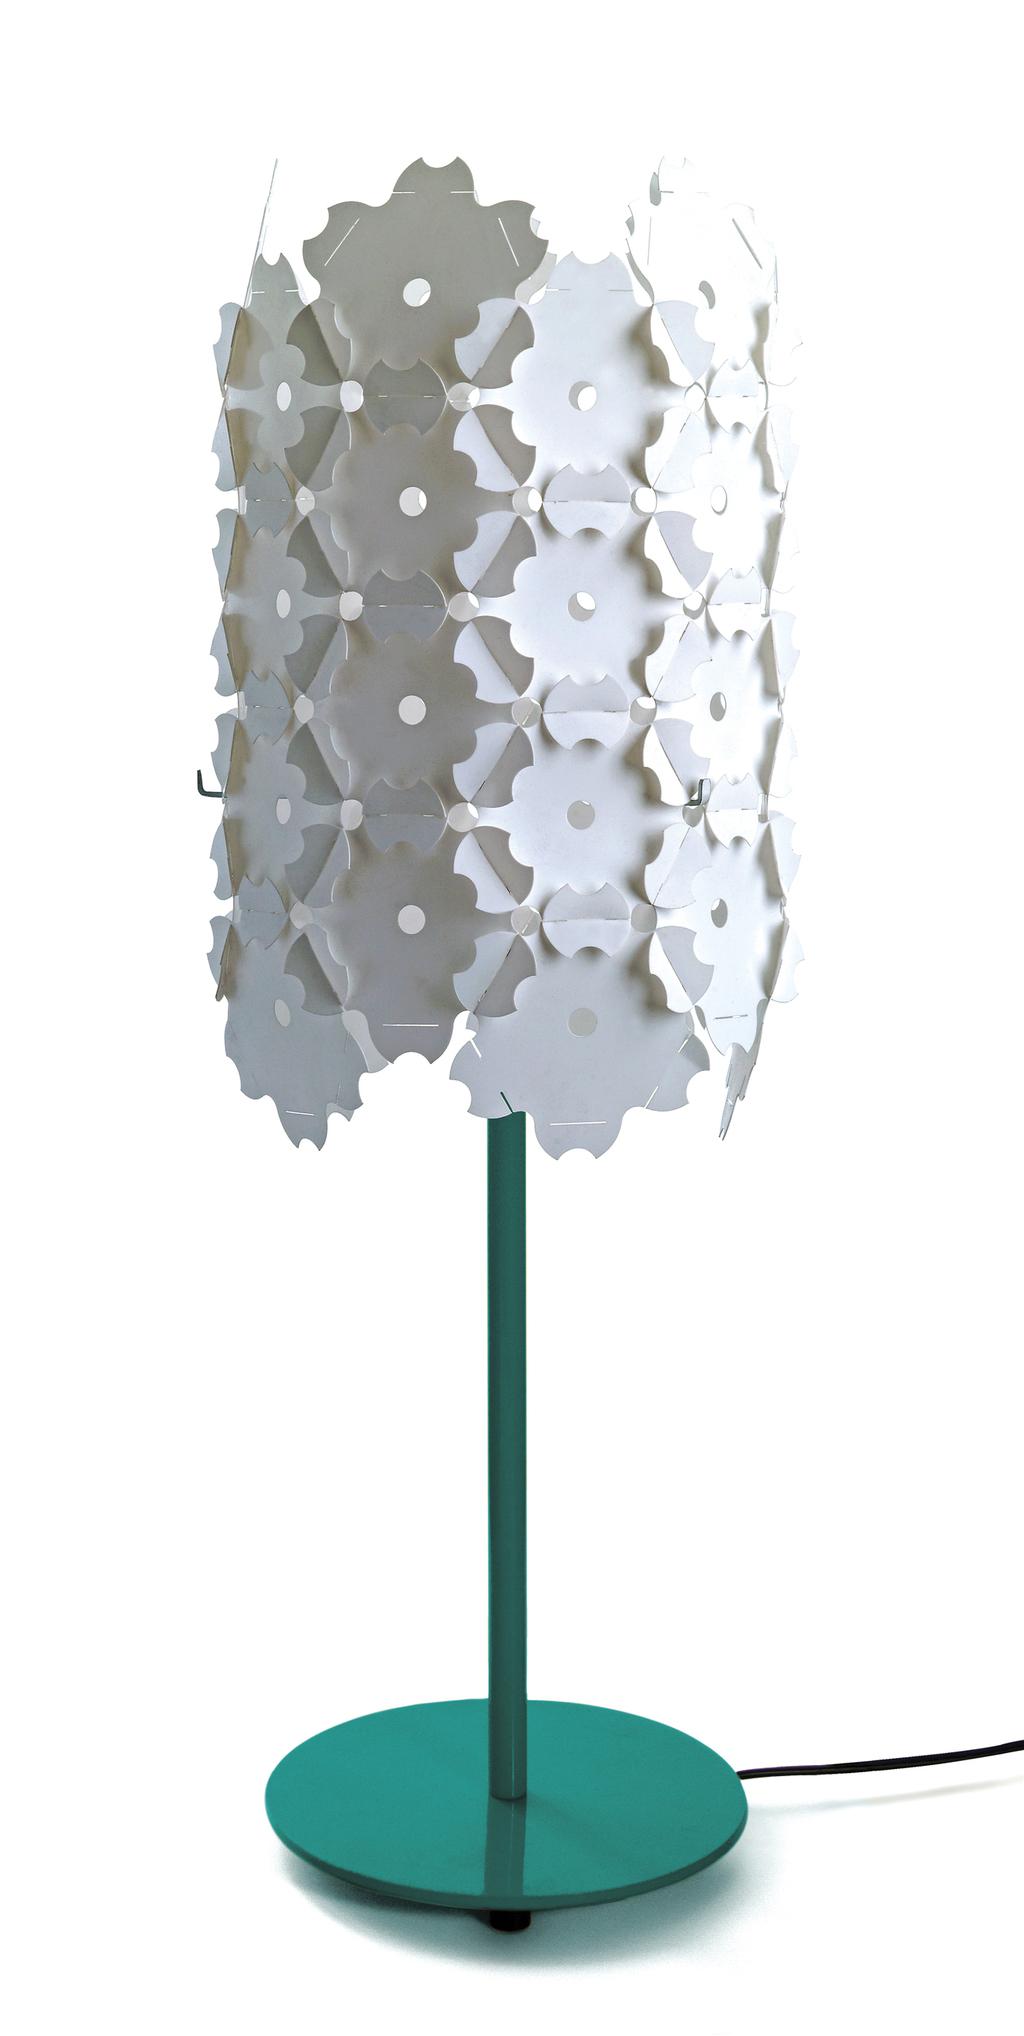 'Amaltas' - modular lamp shade and it variation